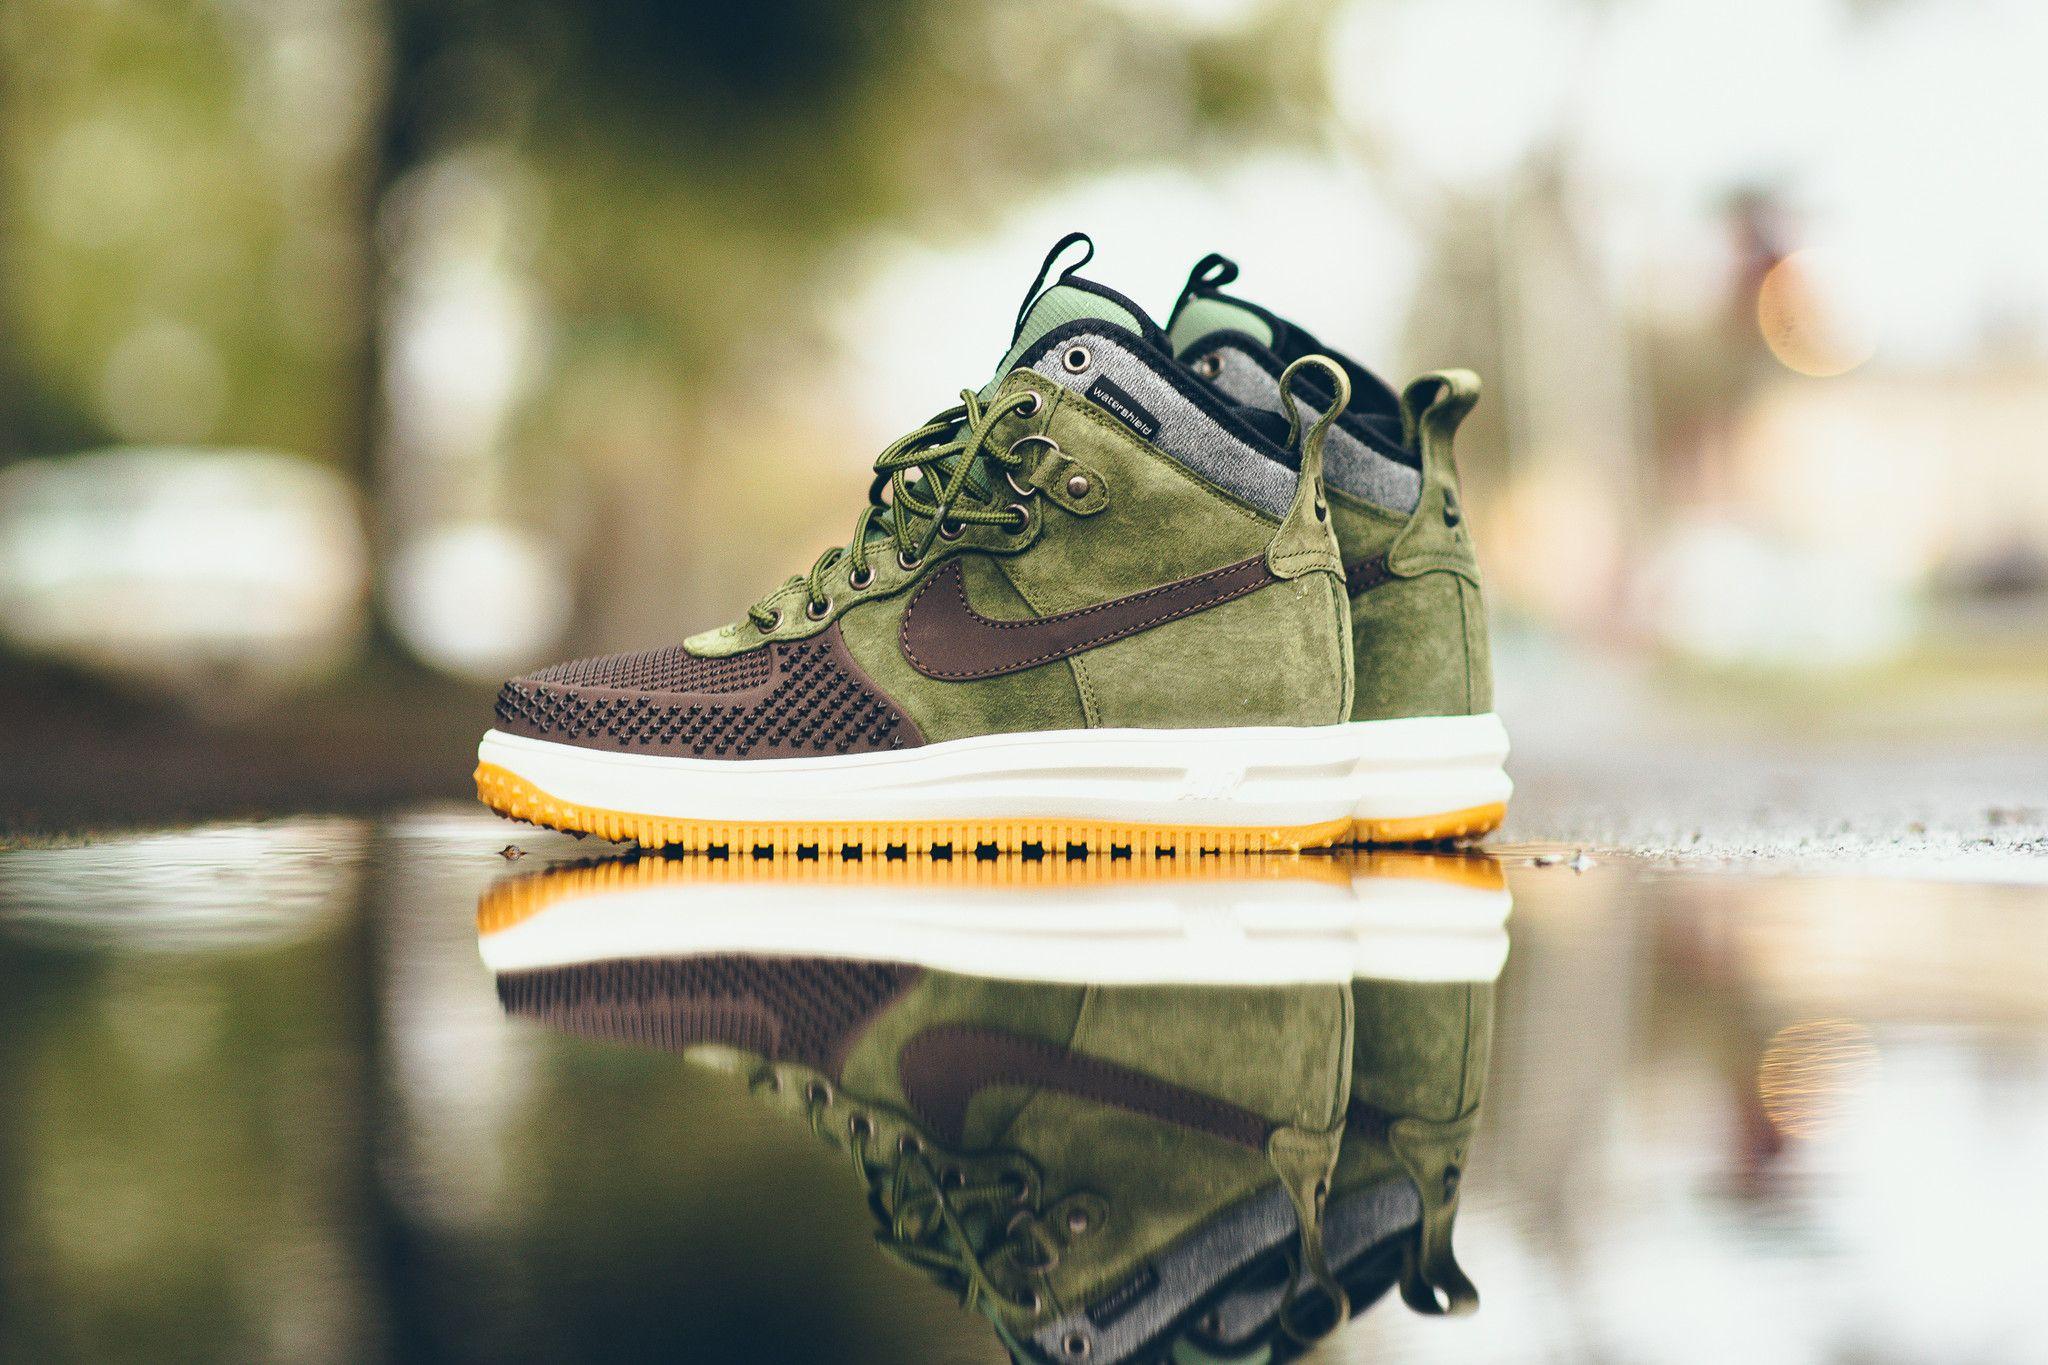 4aaf99c65c91 Nike Lunar Force 1 Duckboot - Baroque Brown Army Olive Gum from Sneaker  Politics